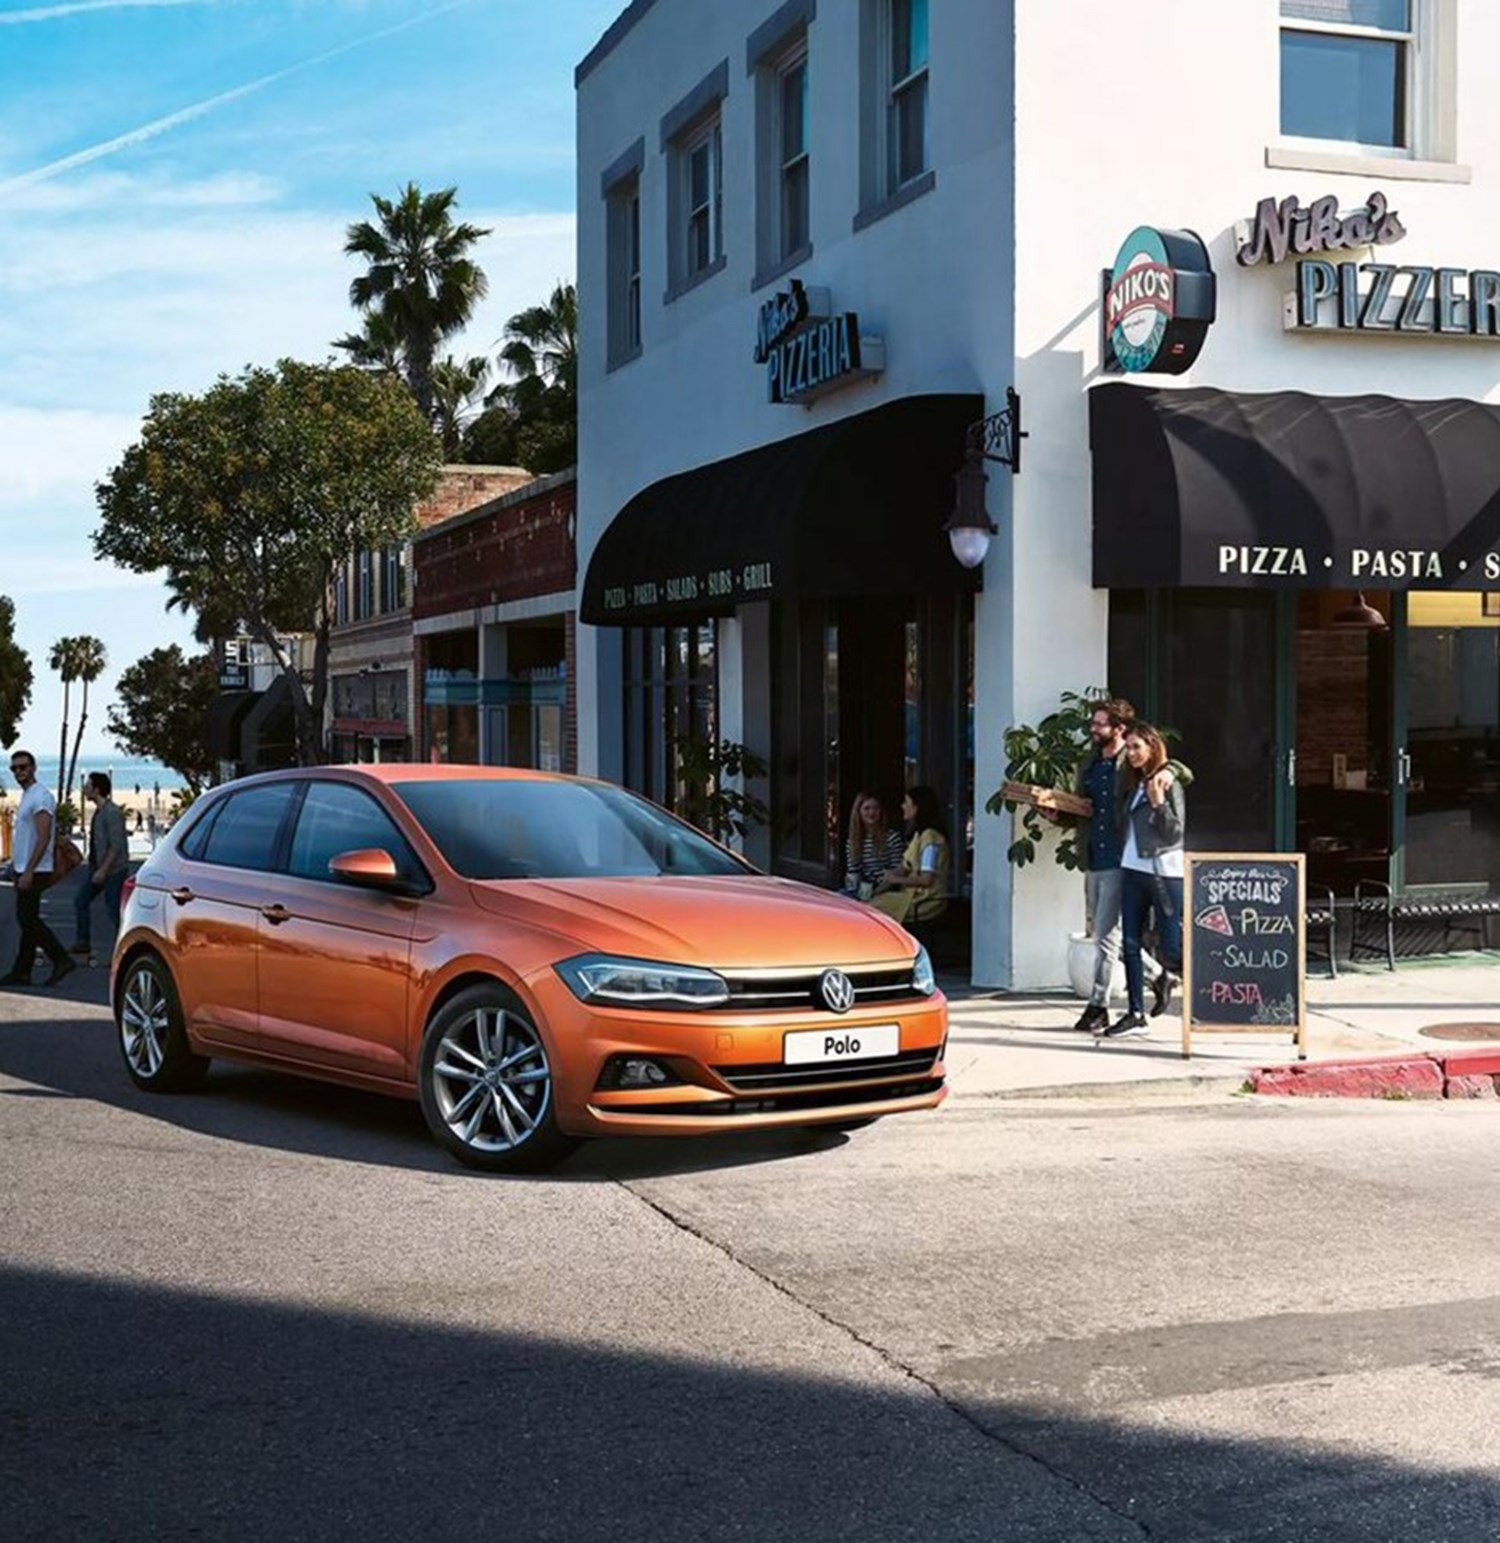 Orange Volkswagen Polo on street corner